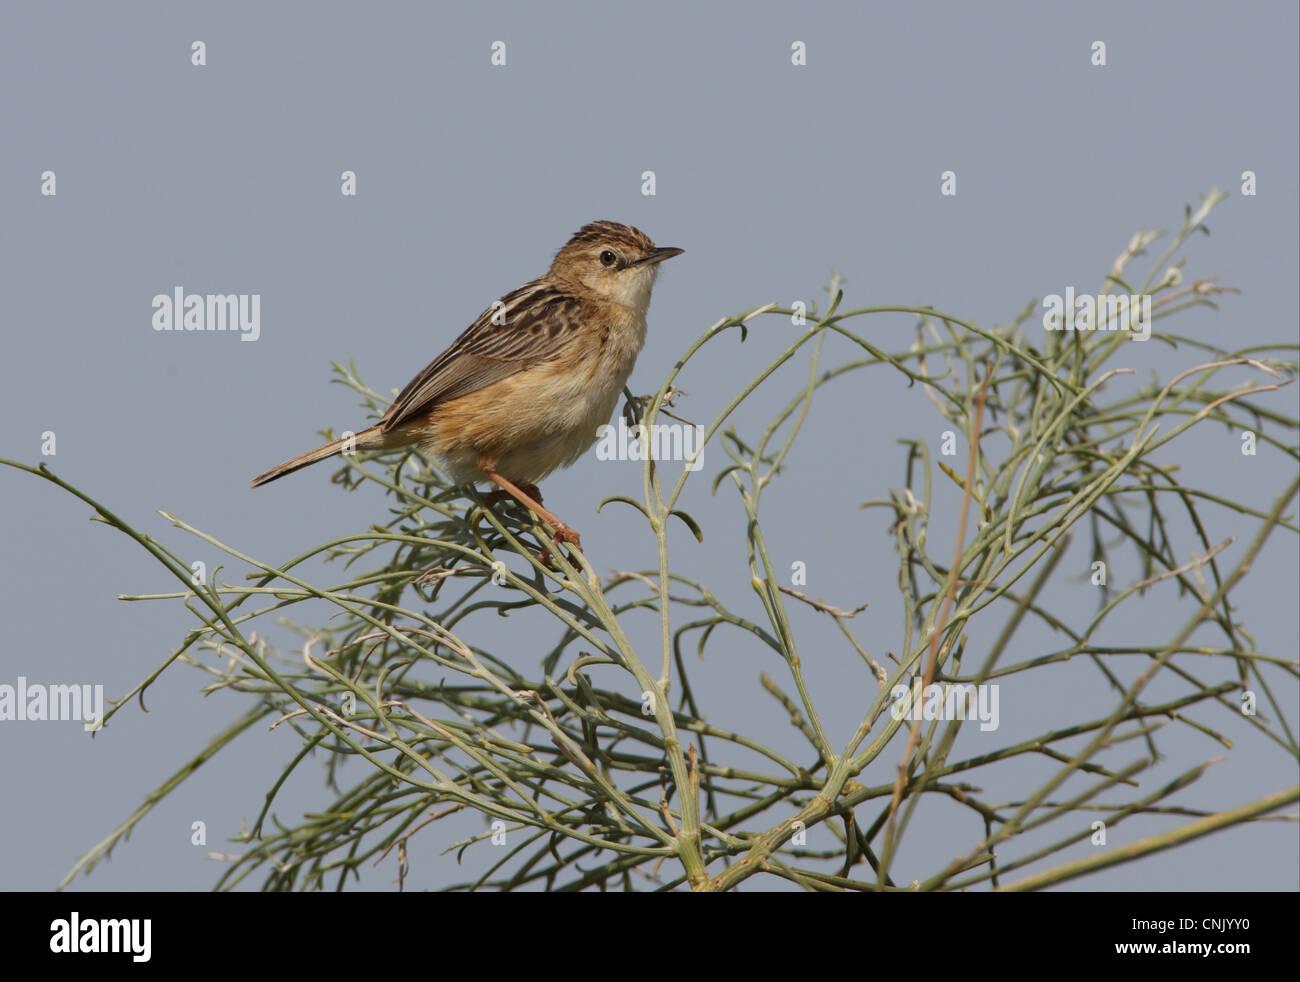 Fan-tailed Warbler (Cisticola juncidis cisticola) adult, perched at top of bush, Ria Formosa N.P., Algarve, Portugal, - Stock Image